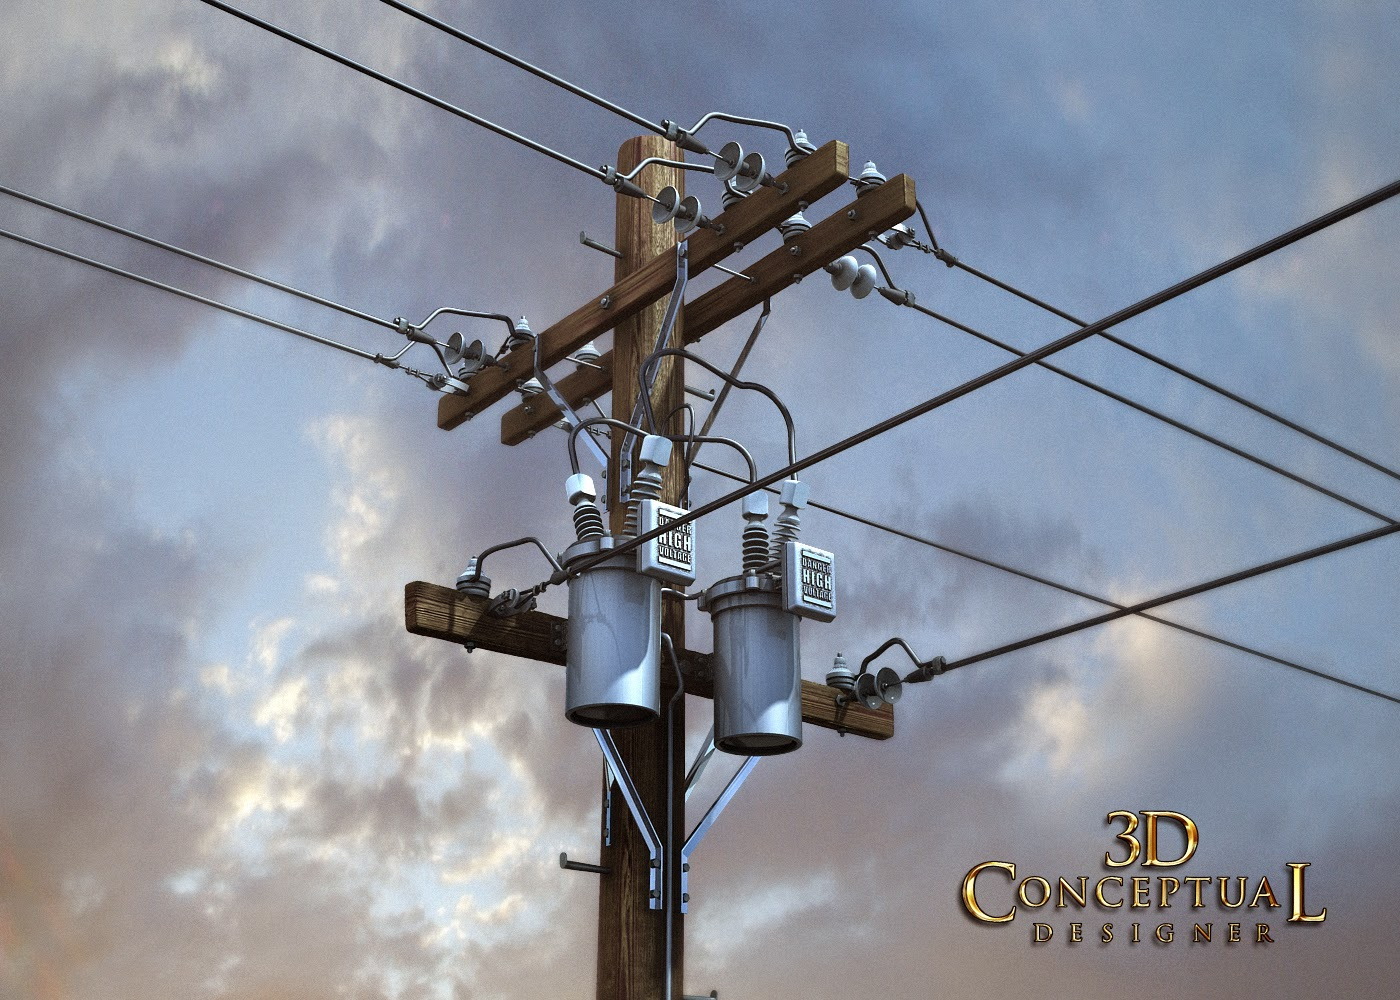 Electric Poles Power Lines : Dconceptualdesigner d stock model sales telephone